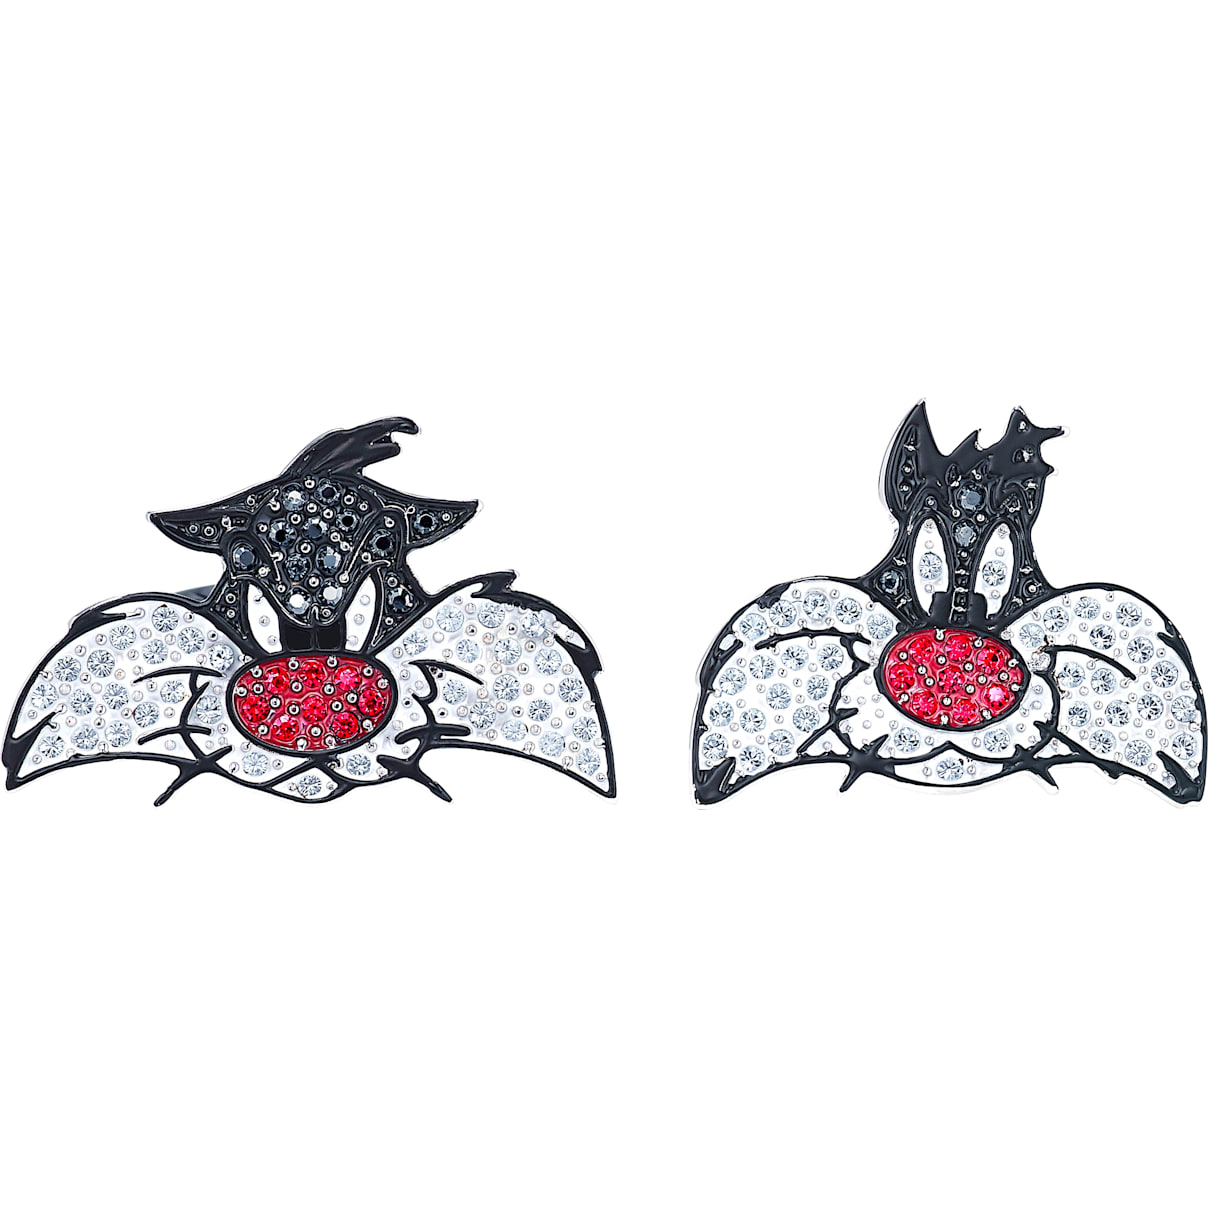 Swarovski Looney Tunes Sylvester Cuff Links, Multi-colored, Rhodium plated